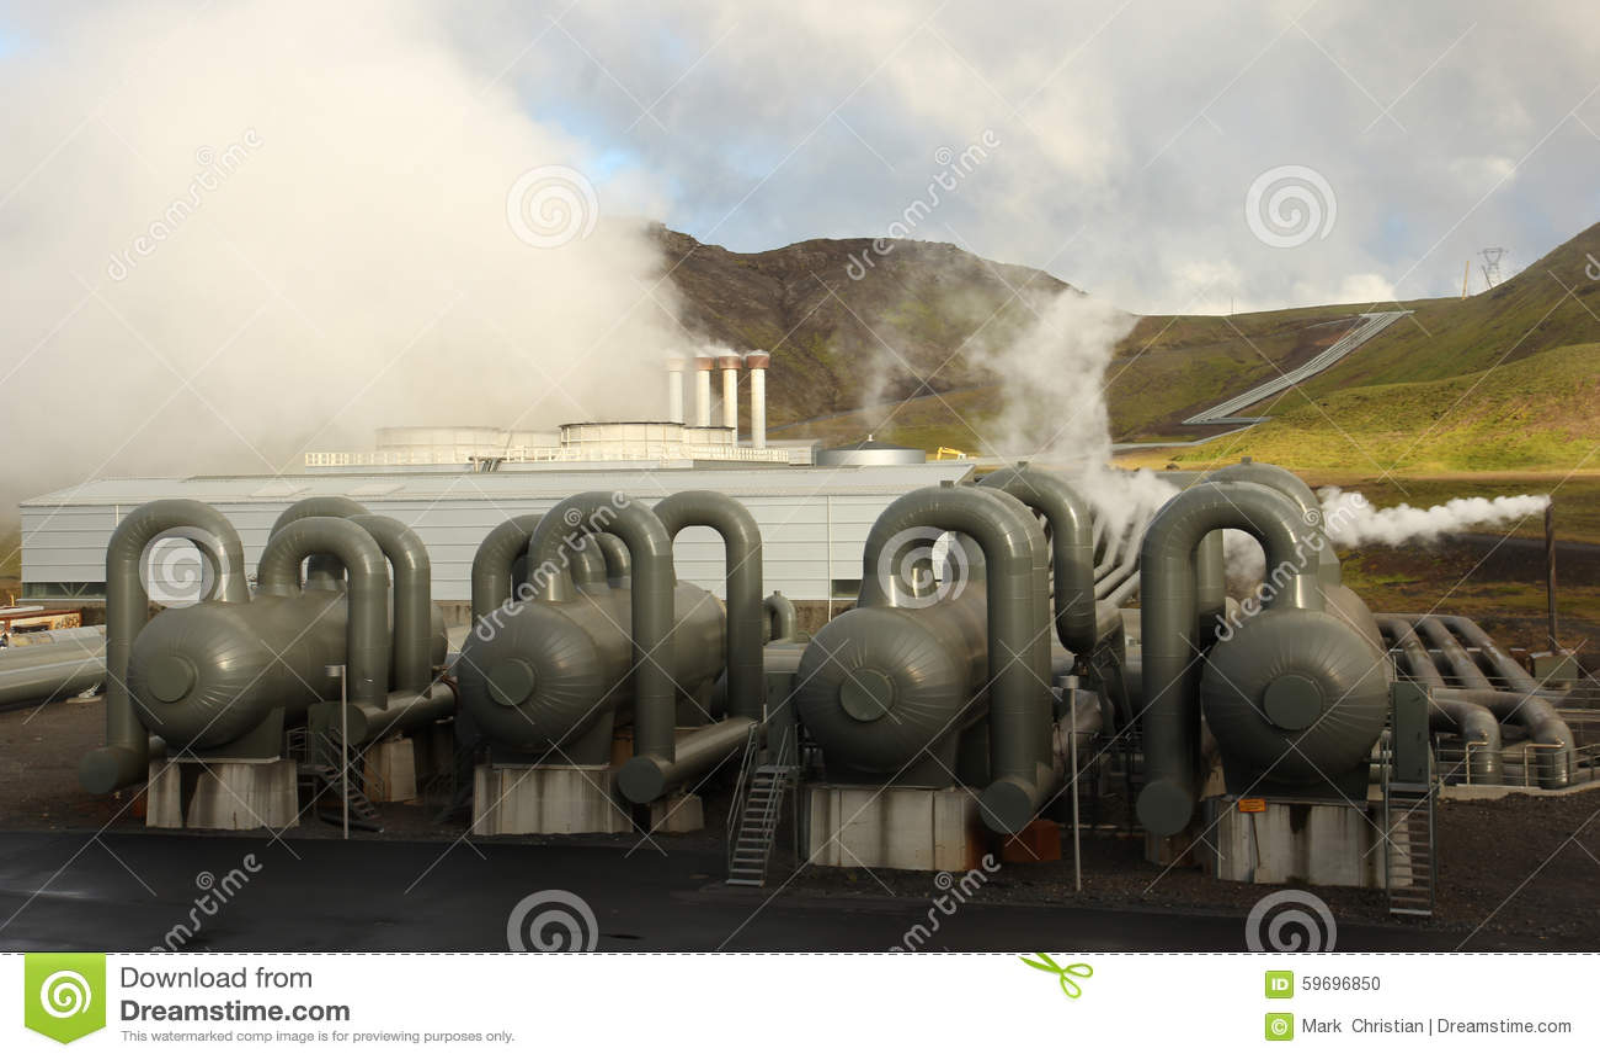 Berühmt Wärmekraftwerk Kessel Fotos - Elektrische Schaltplan-Ideen ...